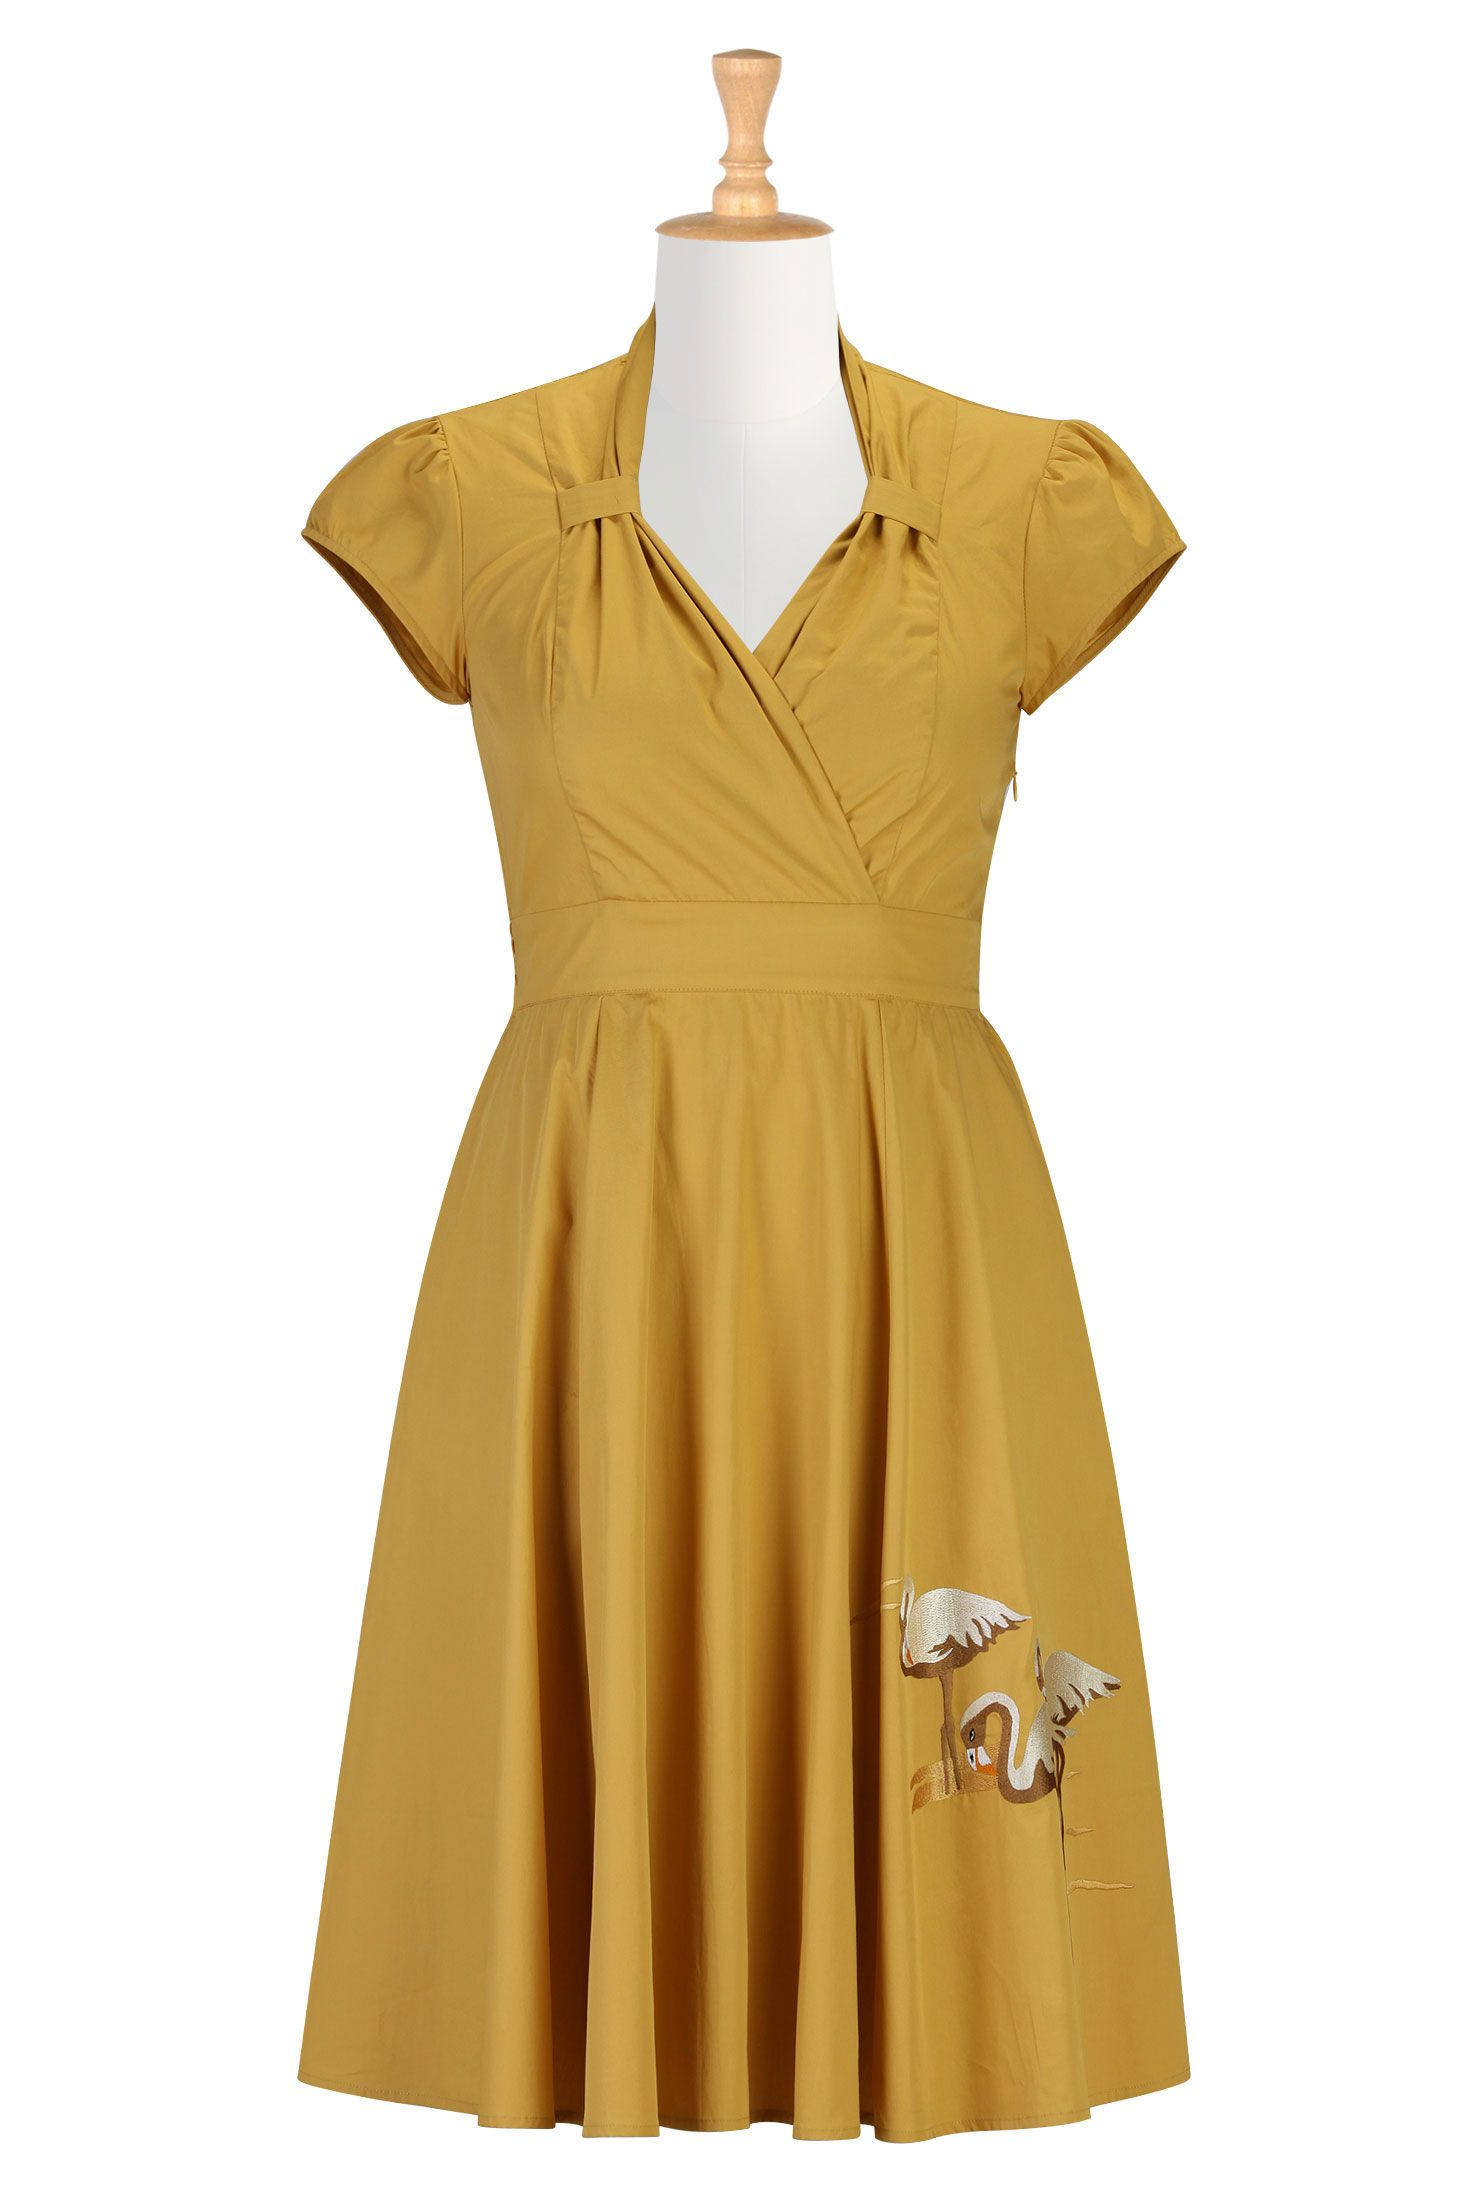 Vintage bridesmaids dresses yellow dress shop womens fashion